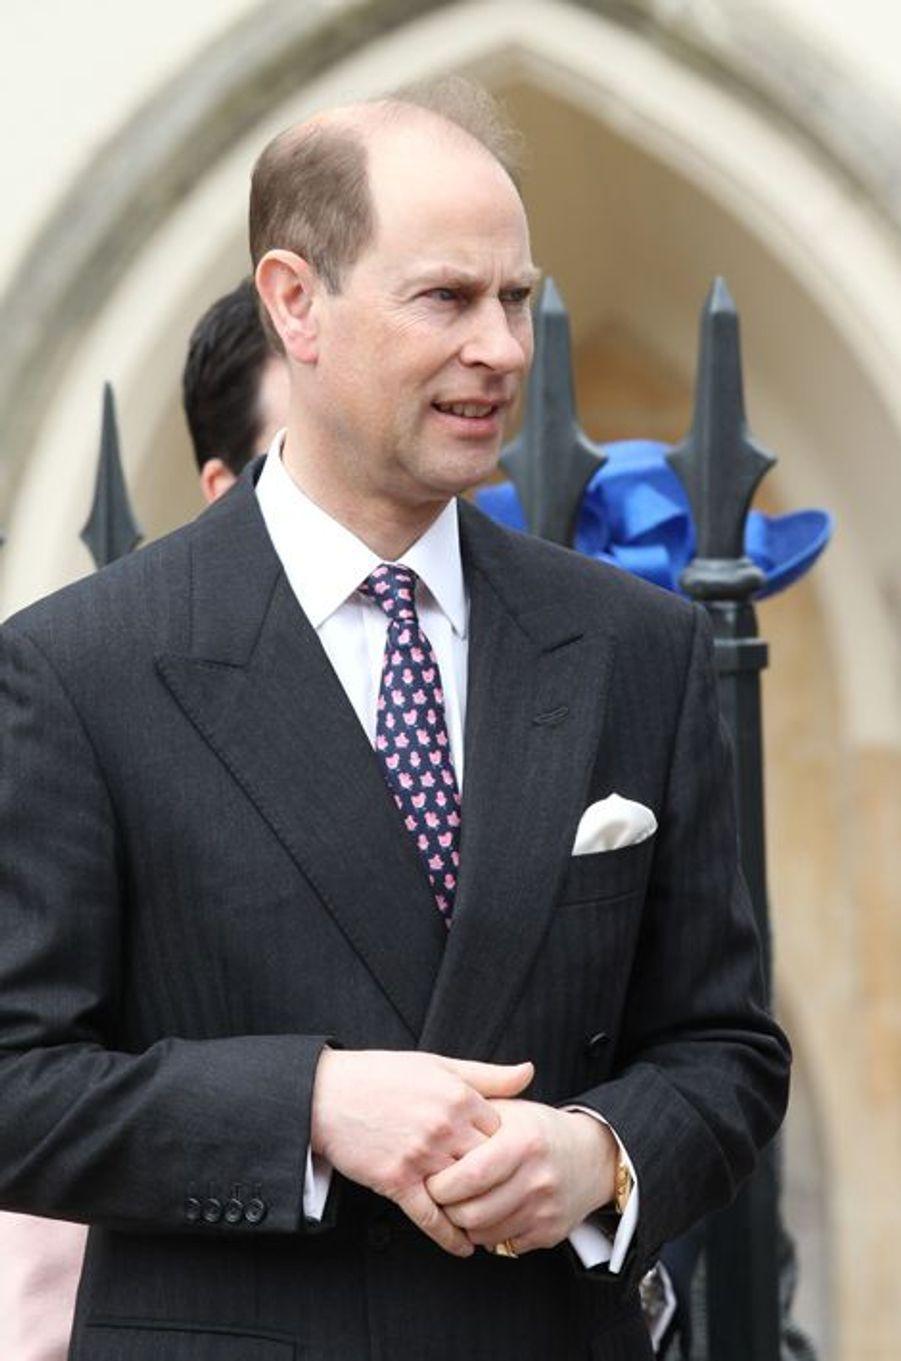 Le prince Edward à Windsor, le 5 avril 2015